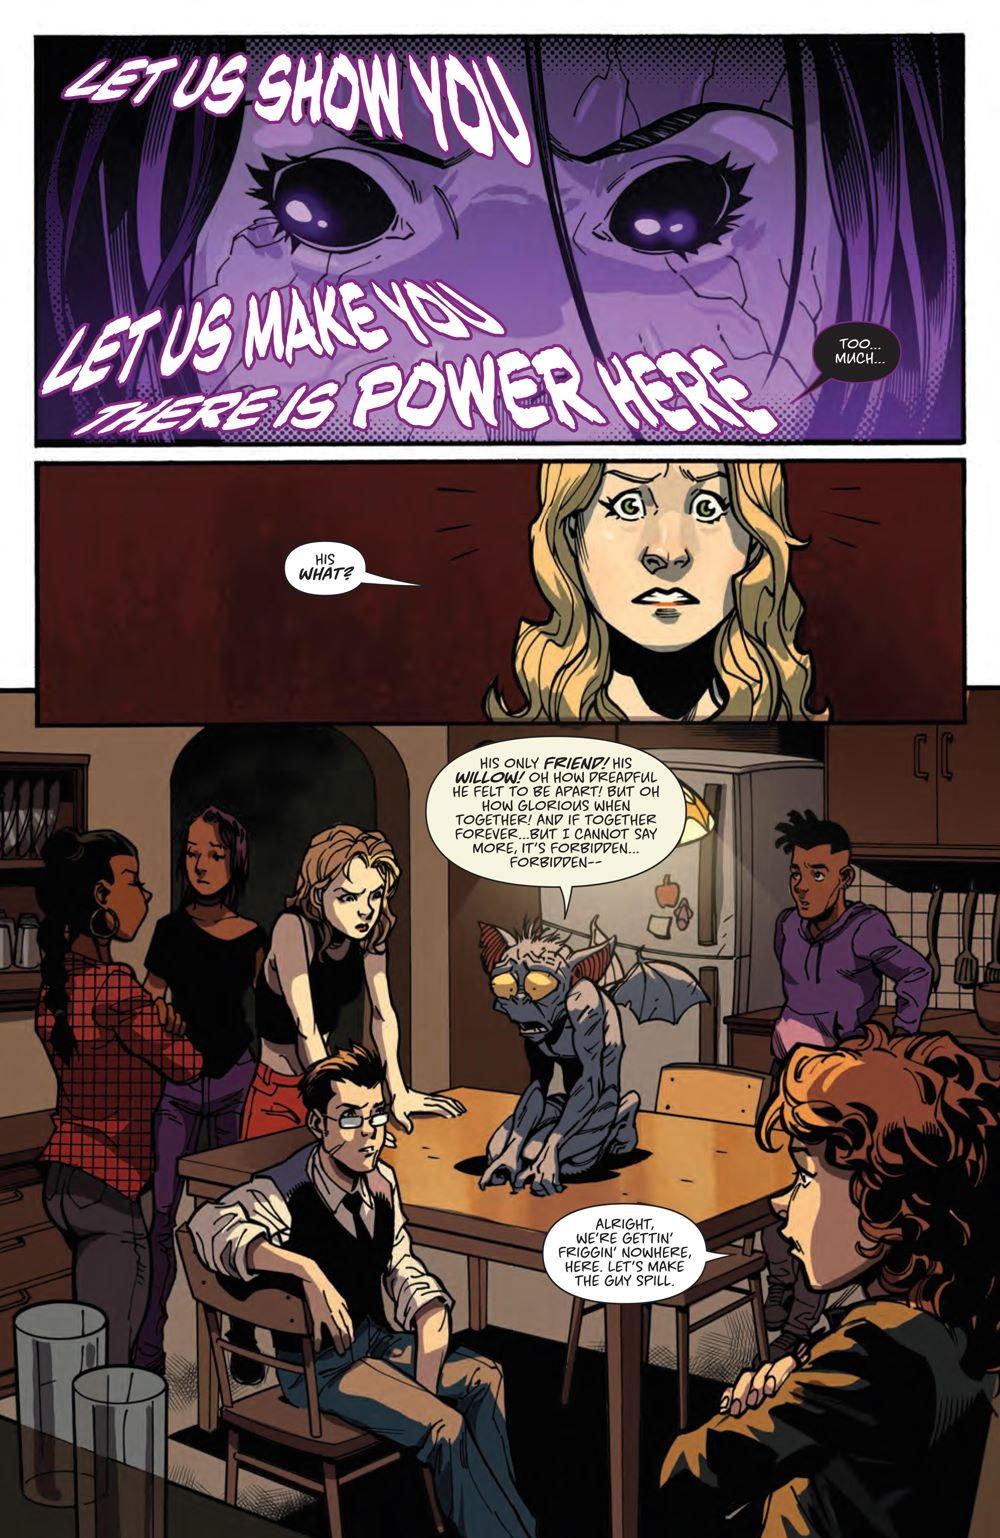 Buffy_023_PRESS_6 ComicList Previews: BUFFY THE VAMPIRE SLAYER #23